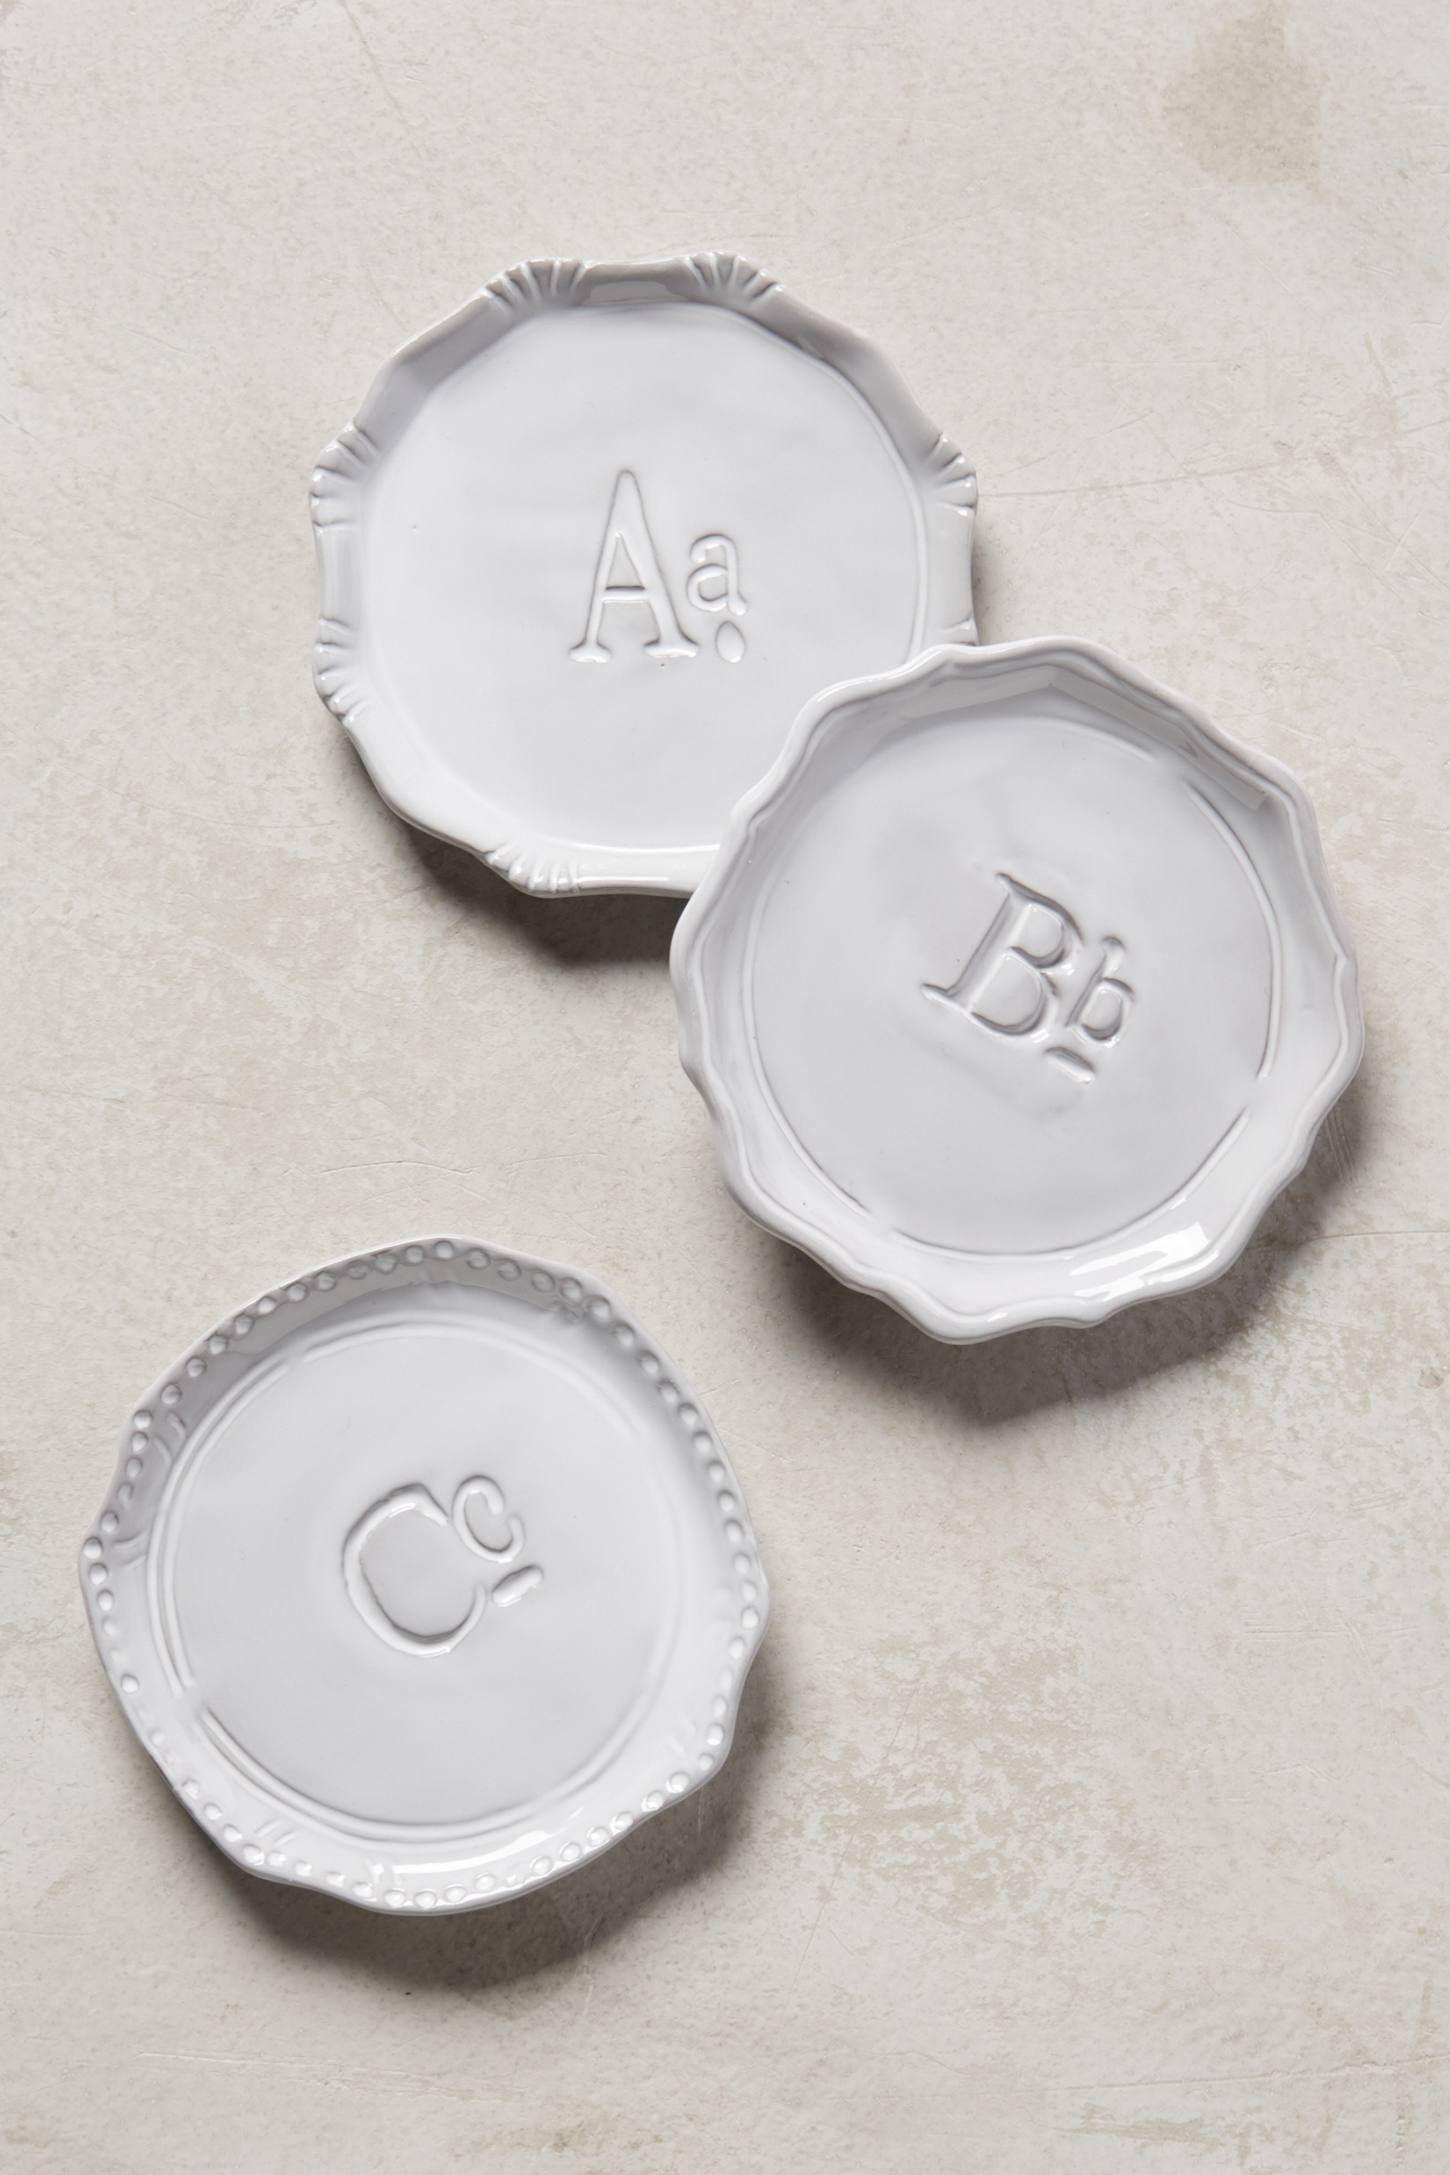 Superscript Monogram Coaster Farm house Tablewares and Kitchens